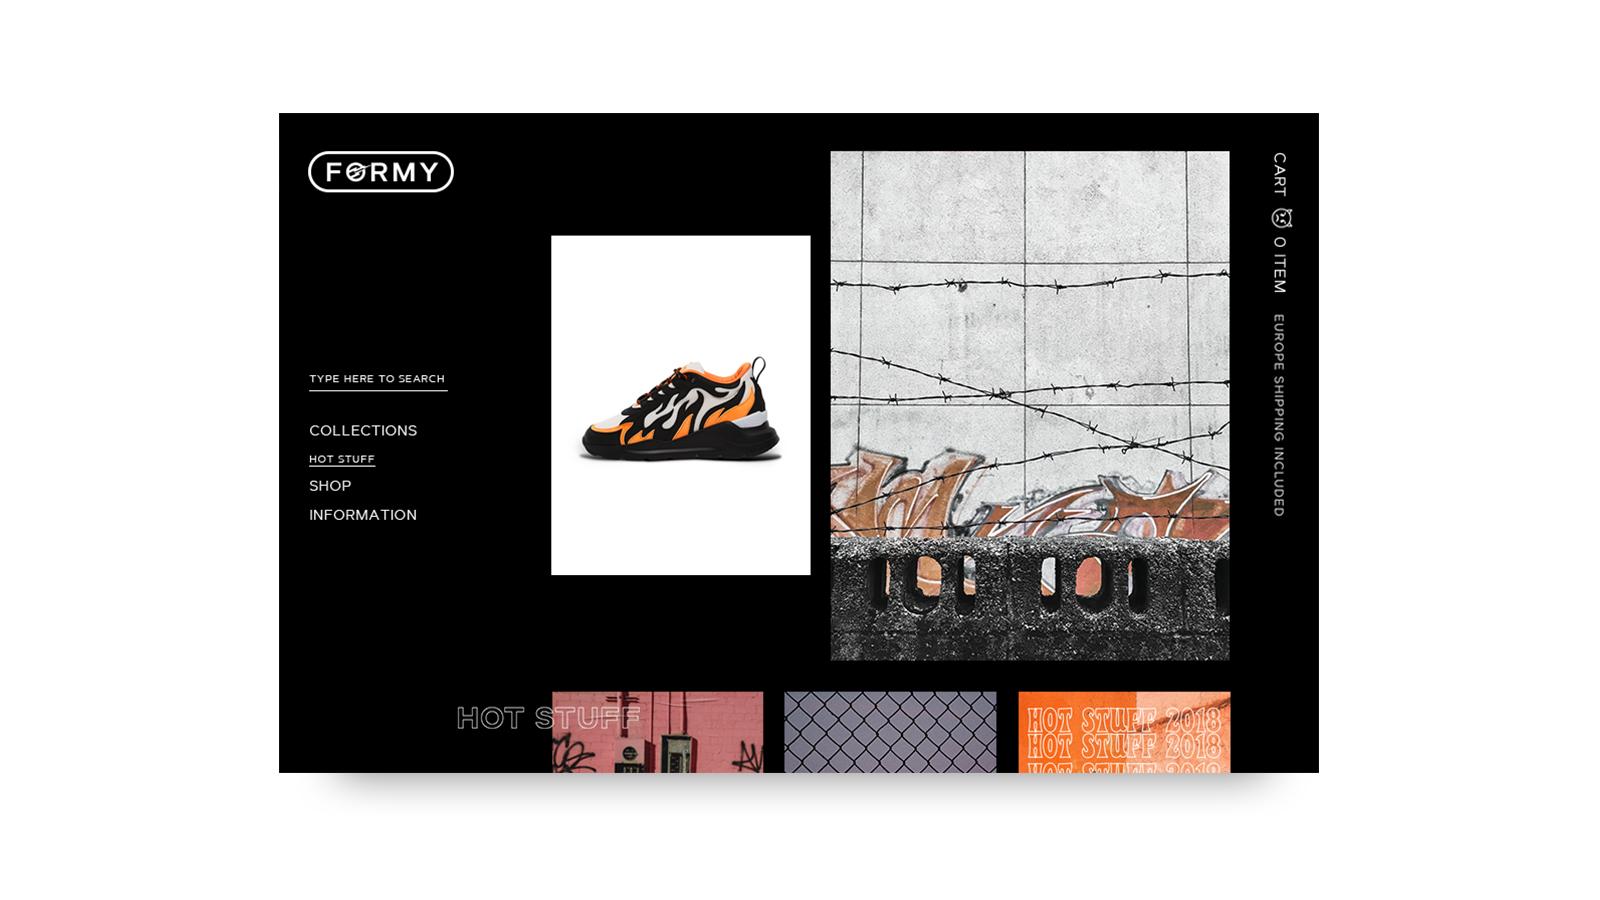 wearenot-studio-projects-formy-studio-web-design-1